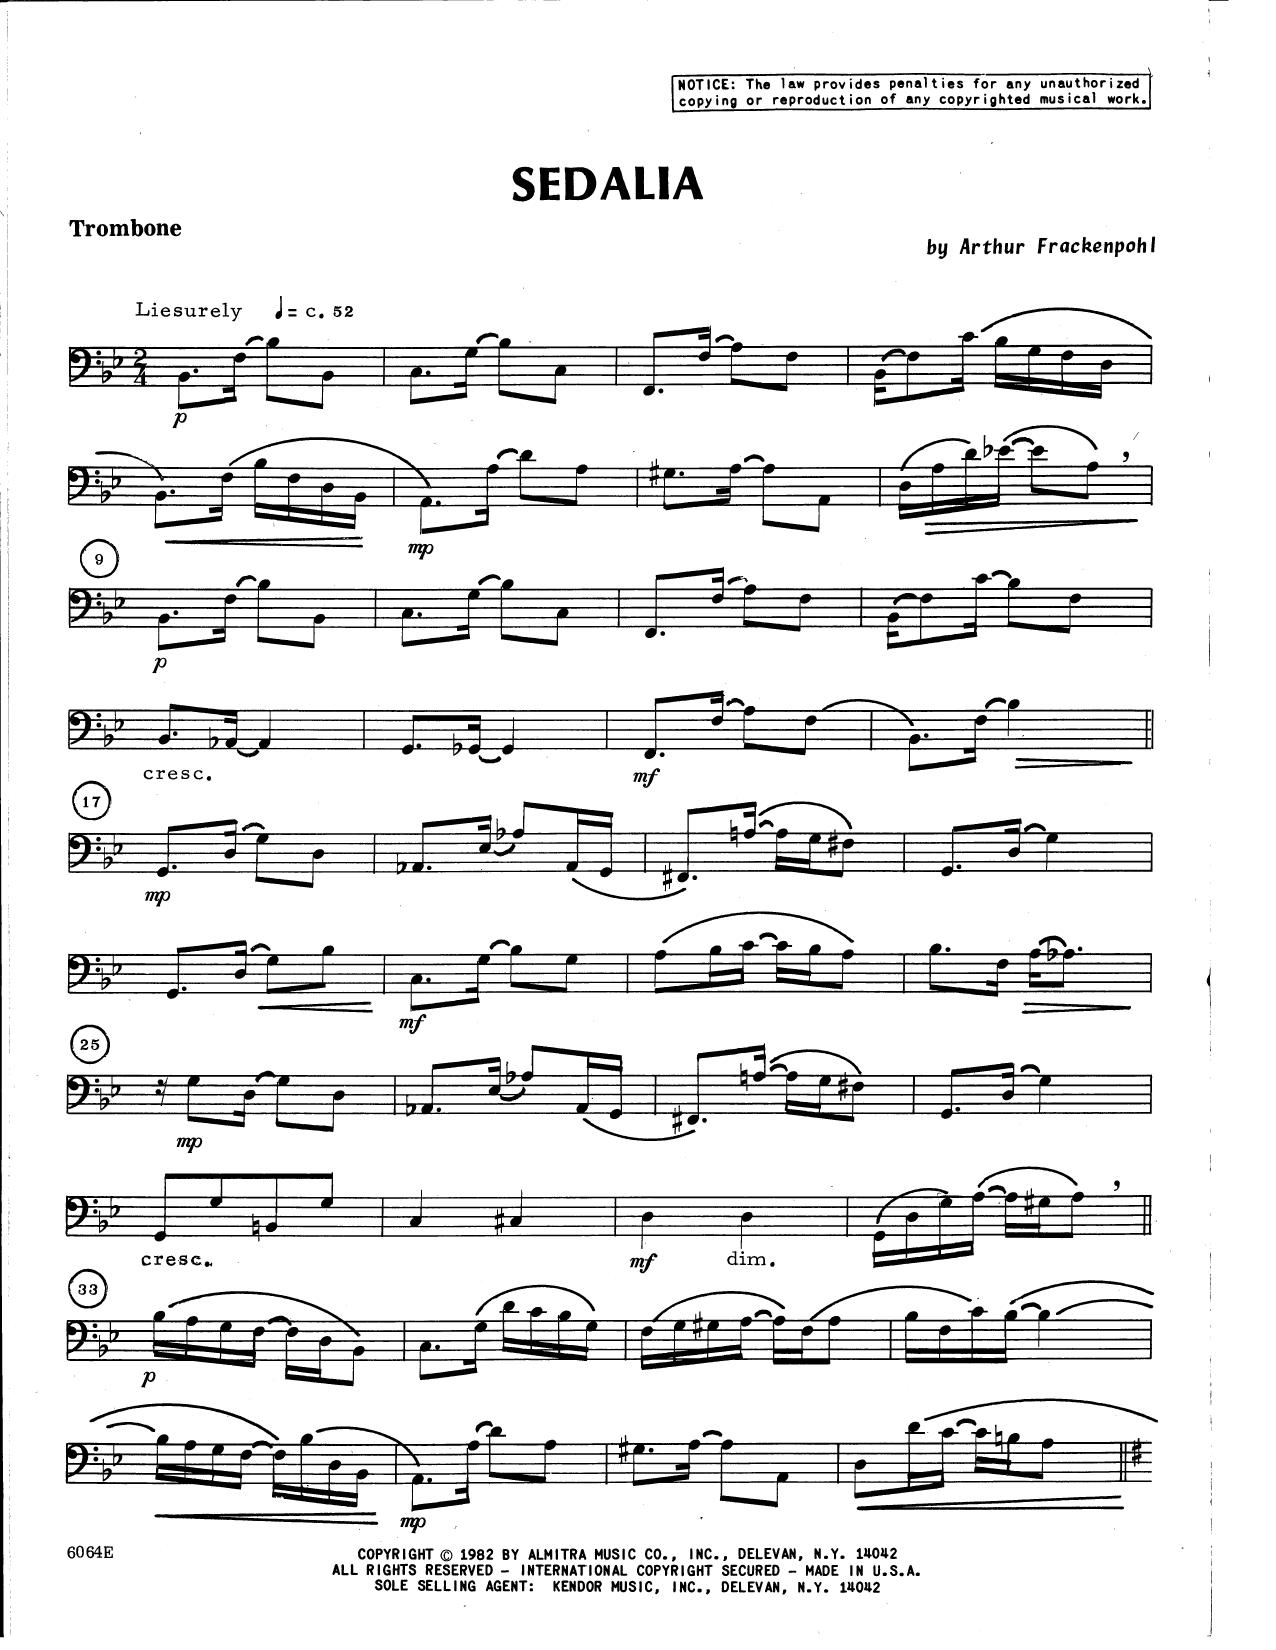 Arthur Frackenpohl Sedalia - Trombone sheet music notes and chords. Download Printable PDF.